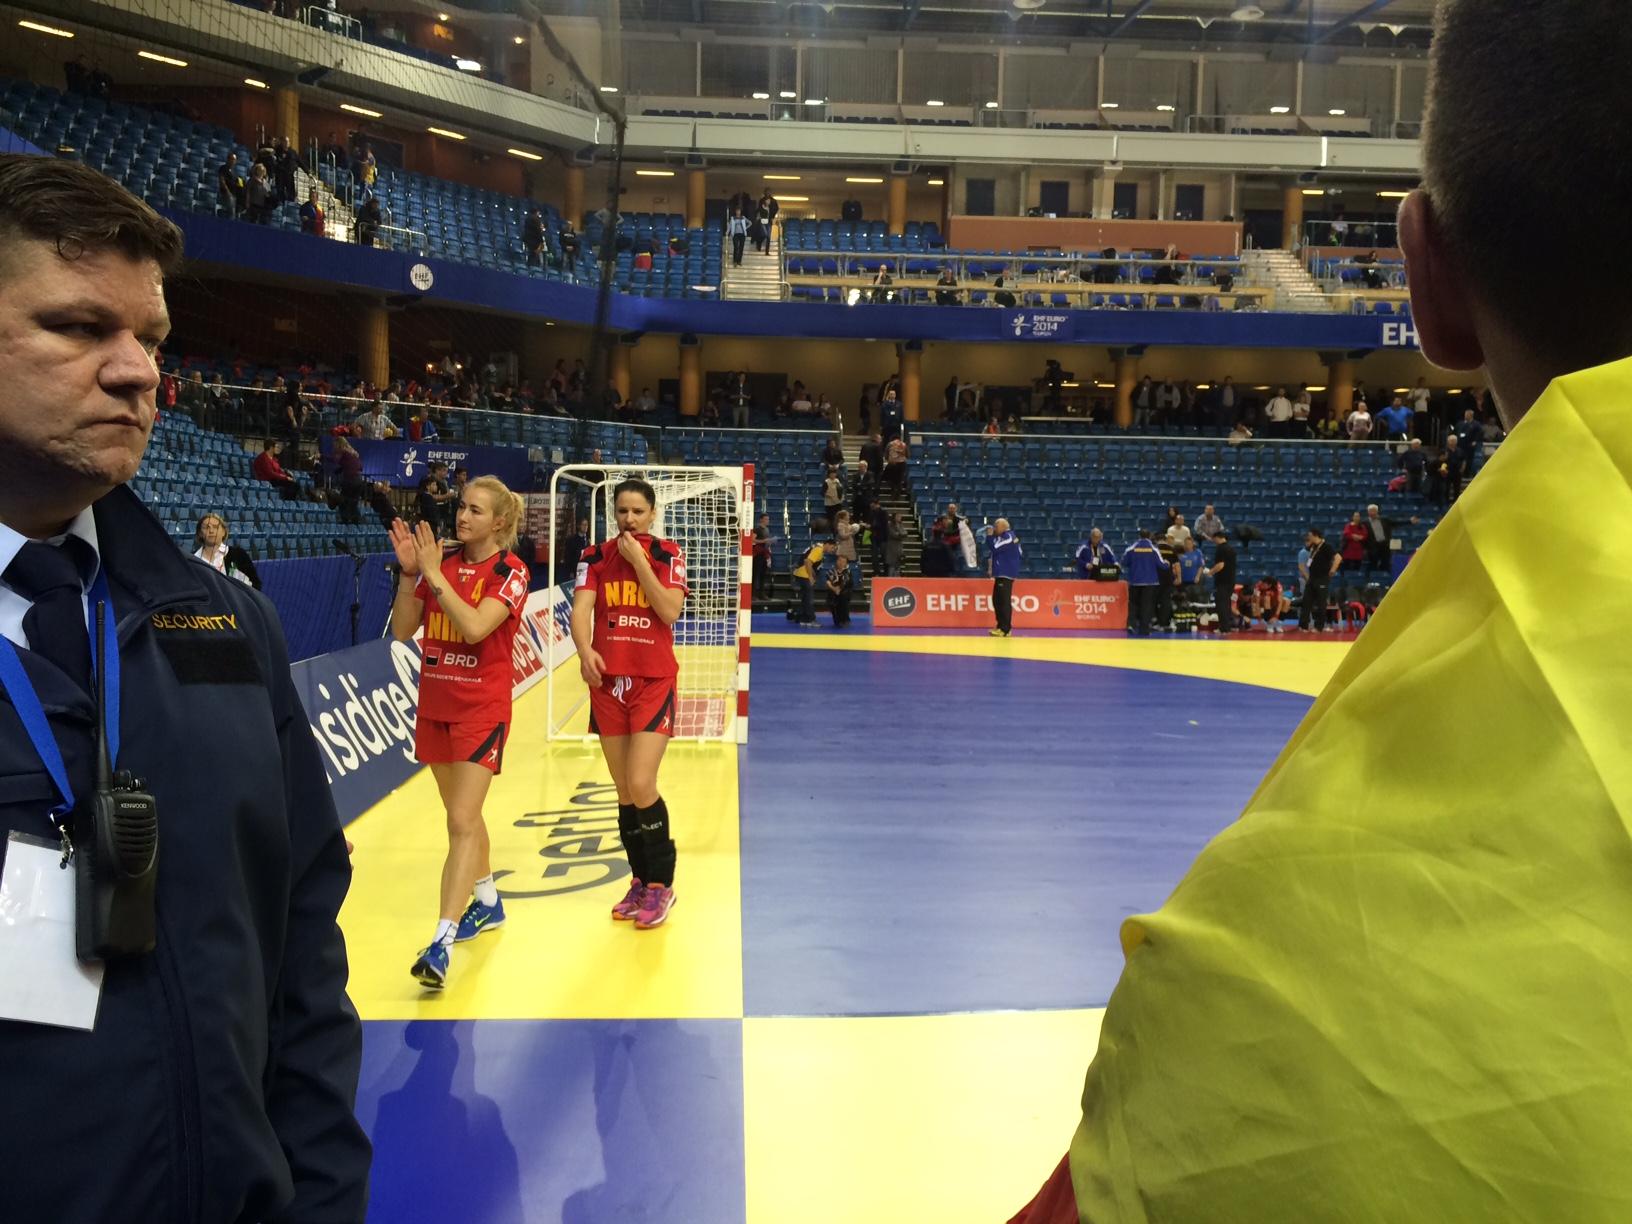 Romania - Danemarca la Campionatul European de Handbal feminin (7)